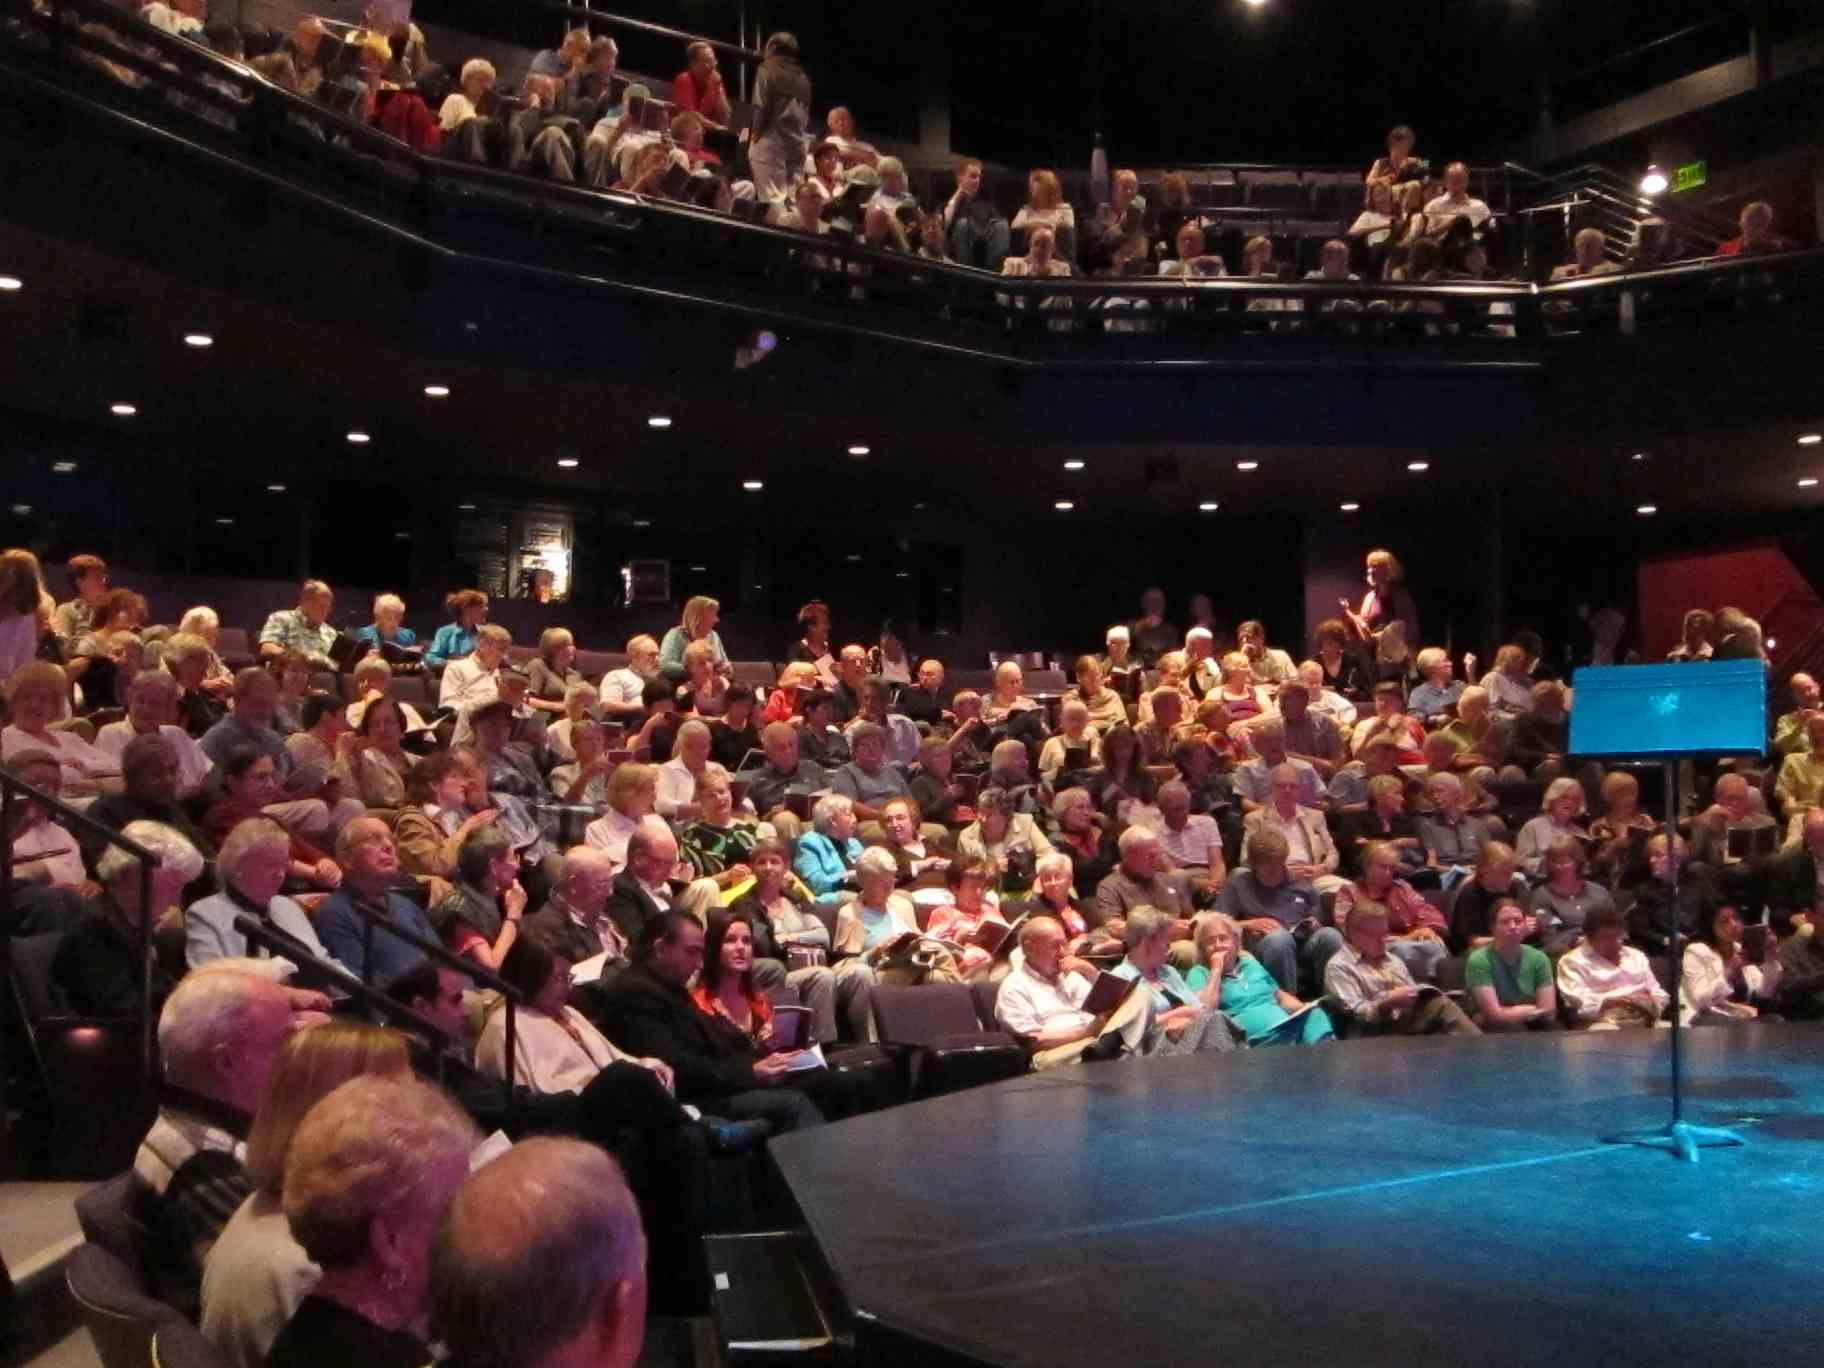 BDDS Playhouse audience